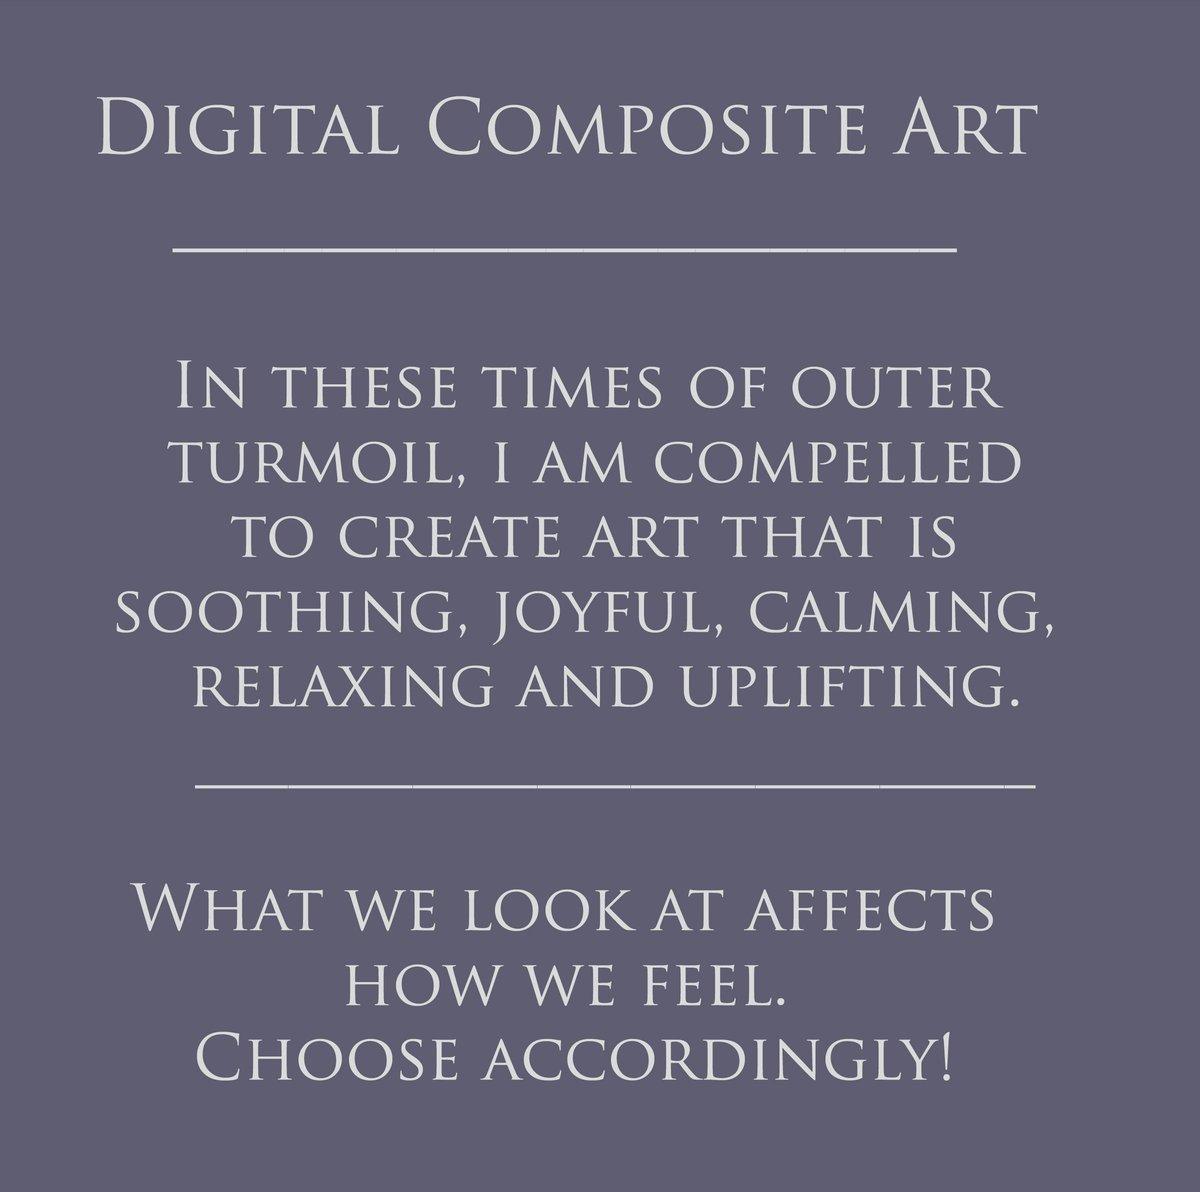 Image of Digital Composite Art